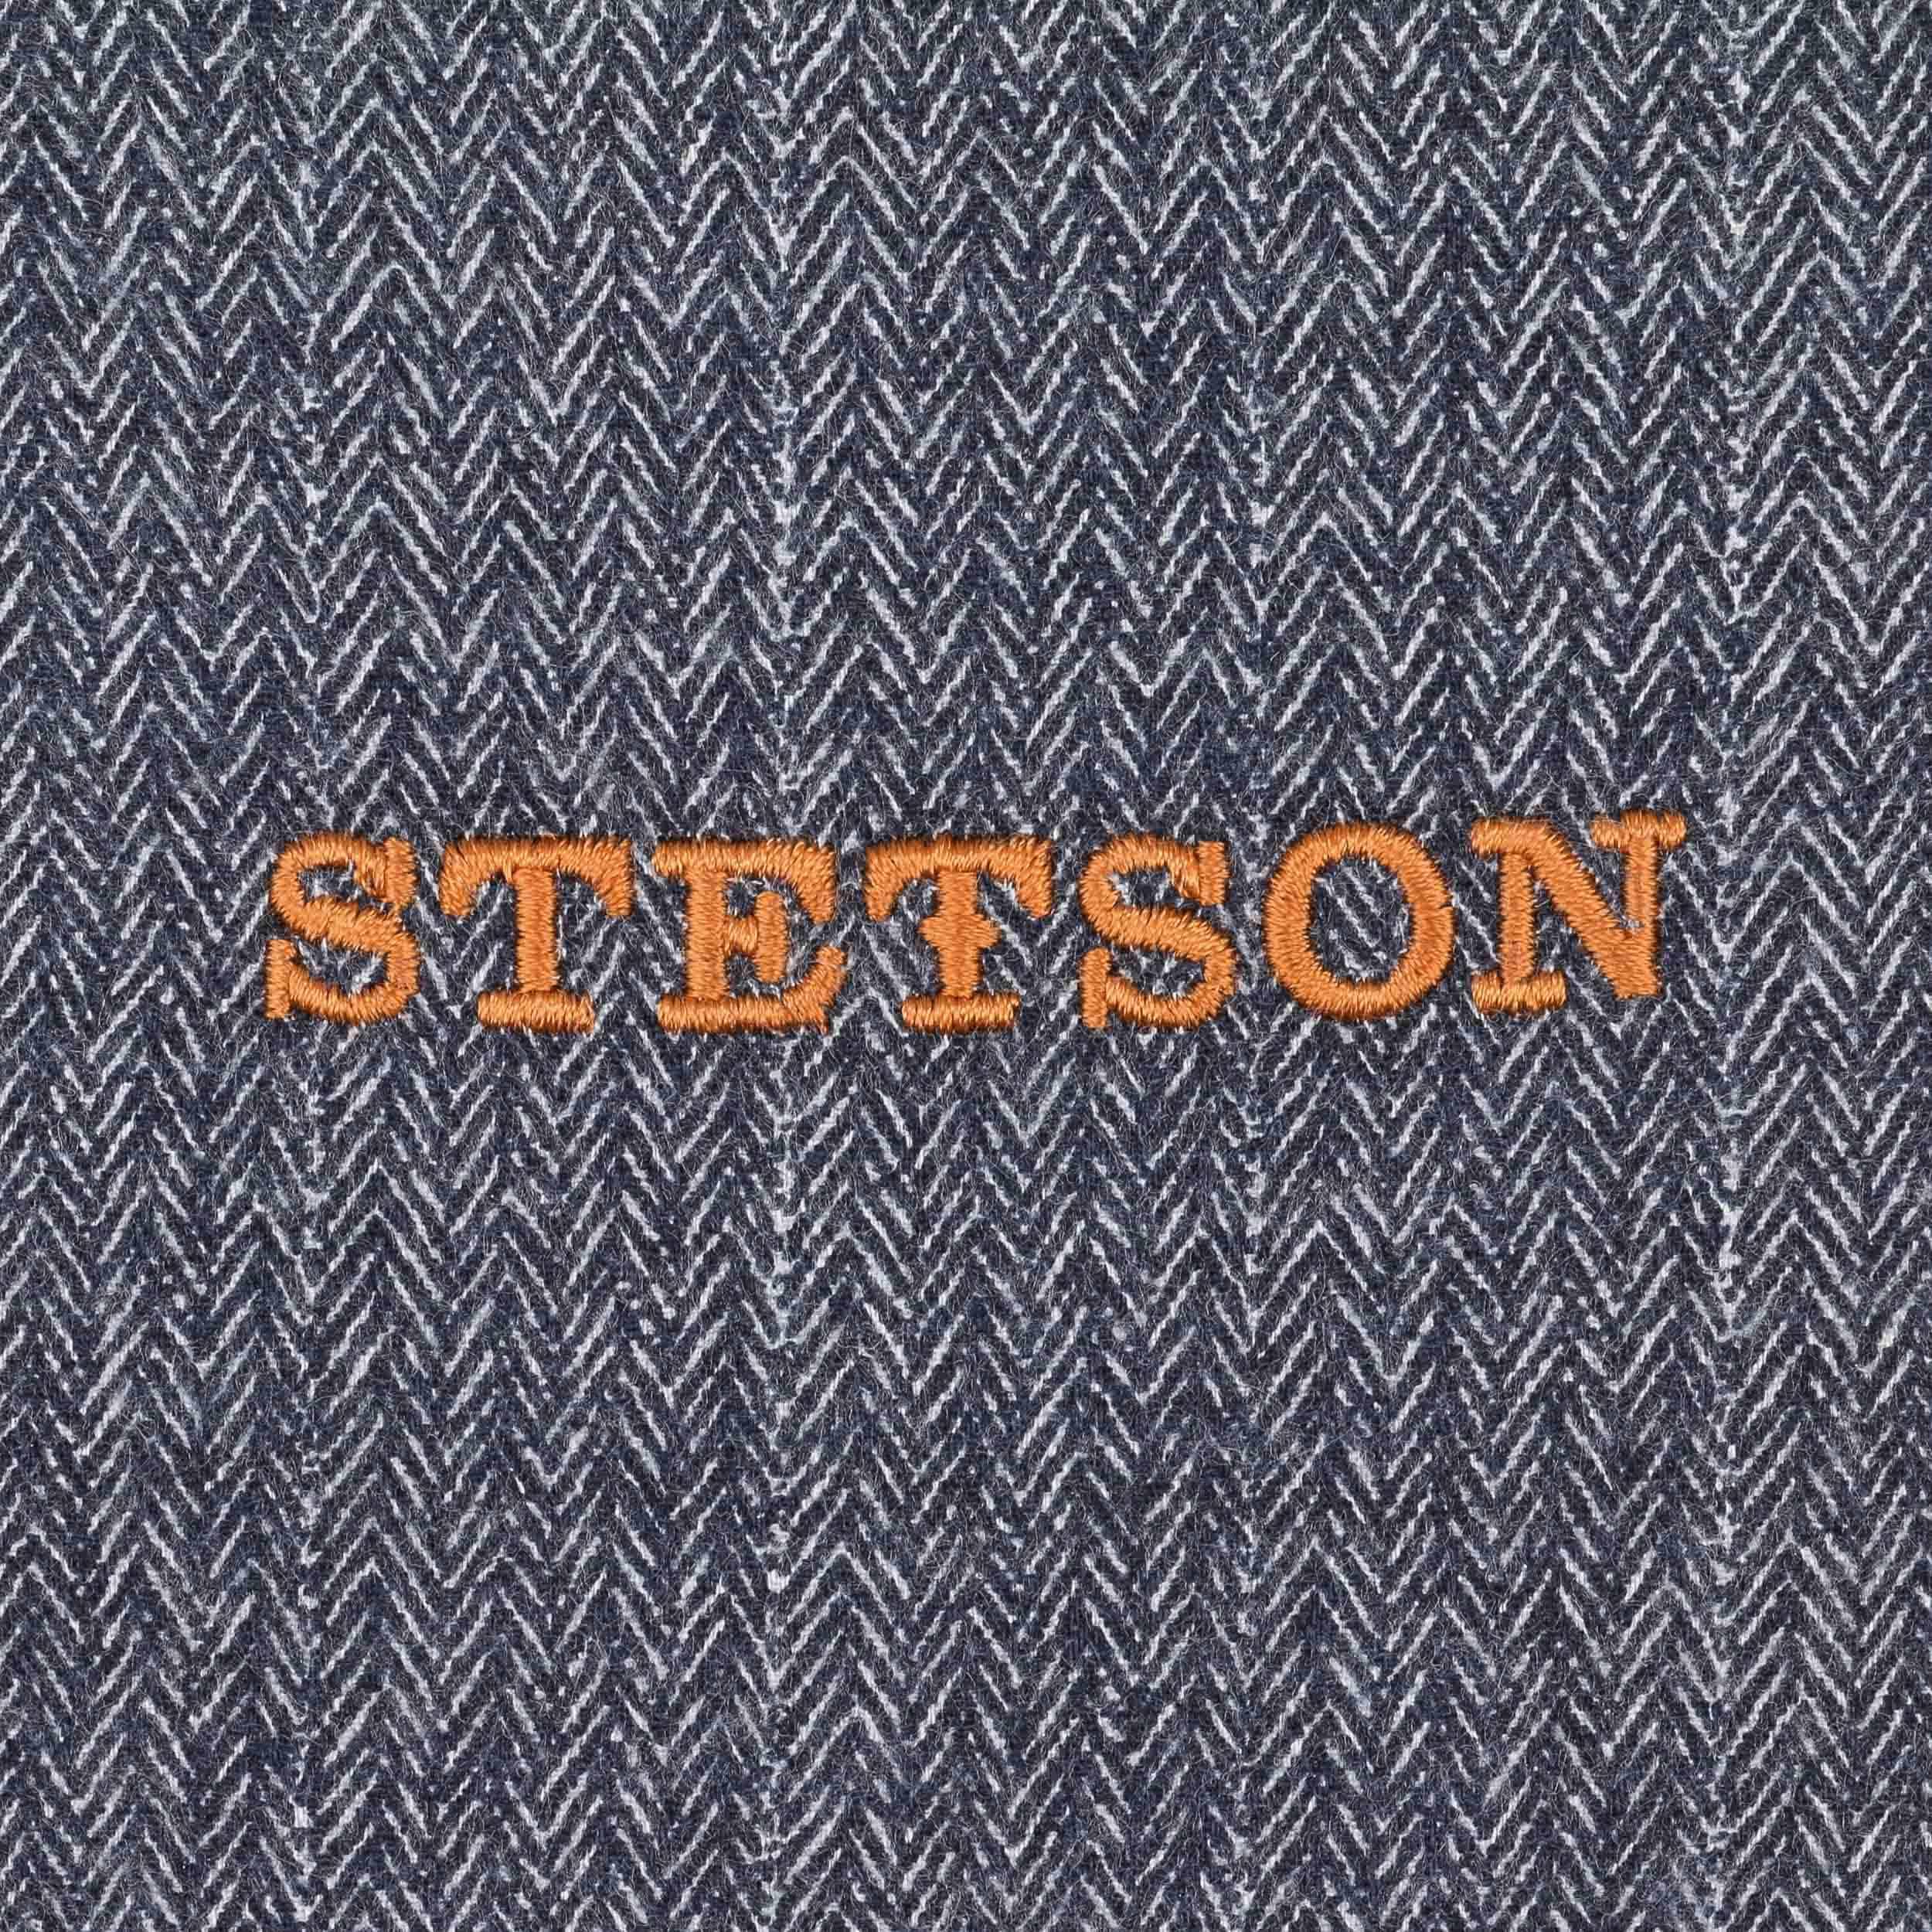 14d66f45 Kent Earflaps Leather Flat Cap By Stetson Eur 119 00